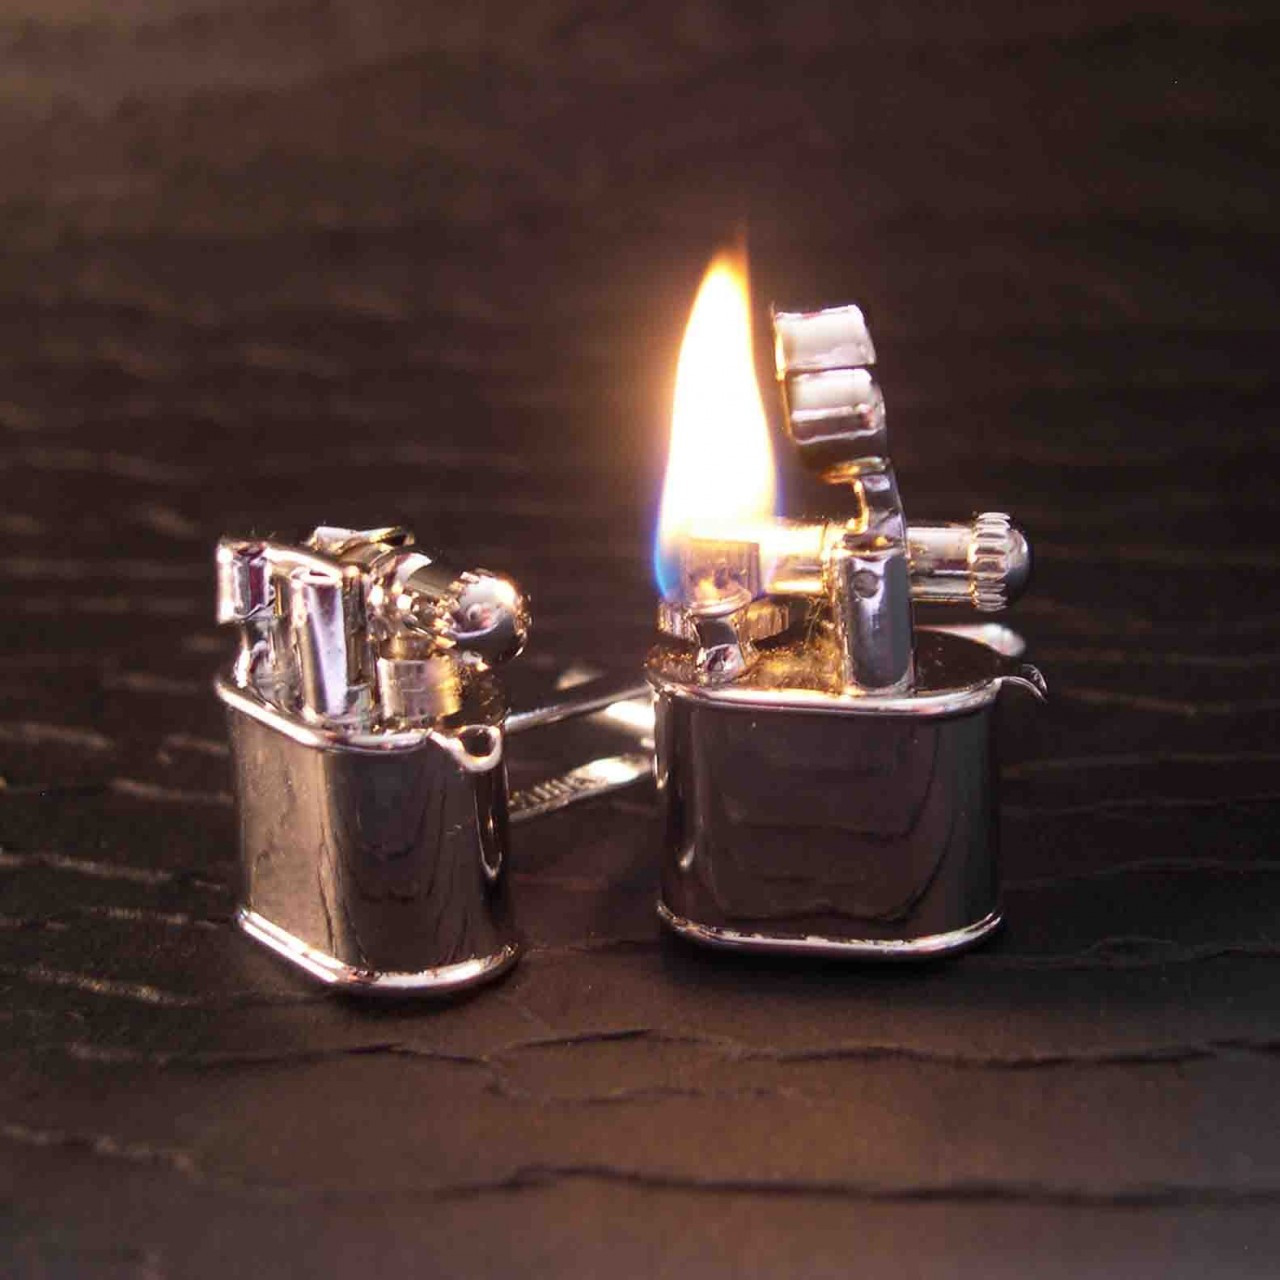 Working Vintage Era Lighter Cufflinks Spy gear tools you